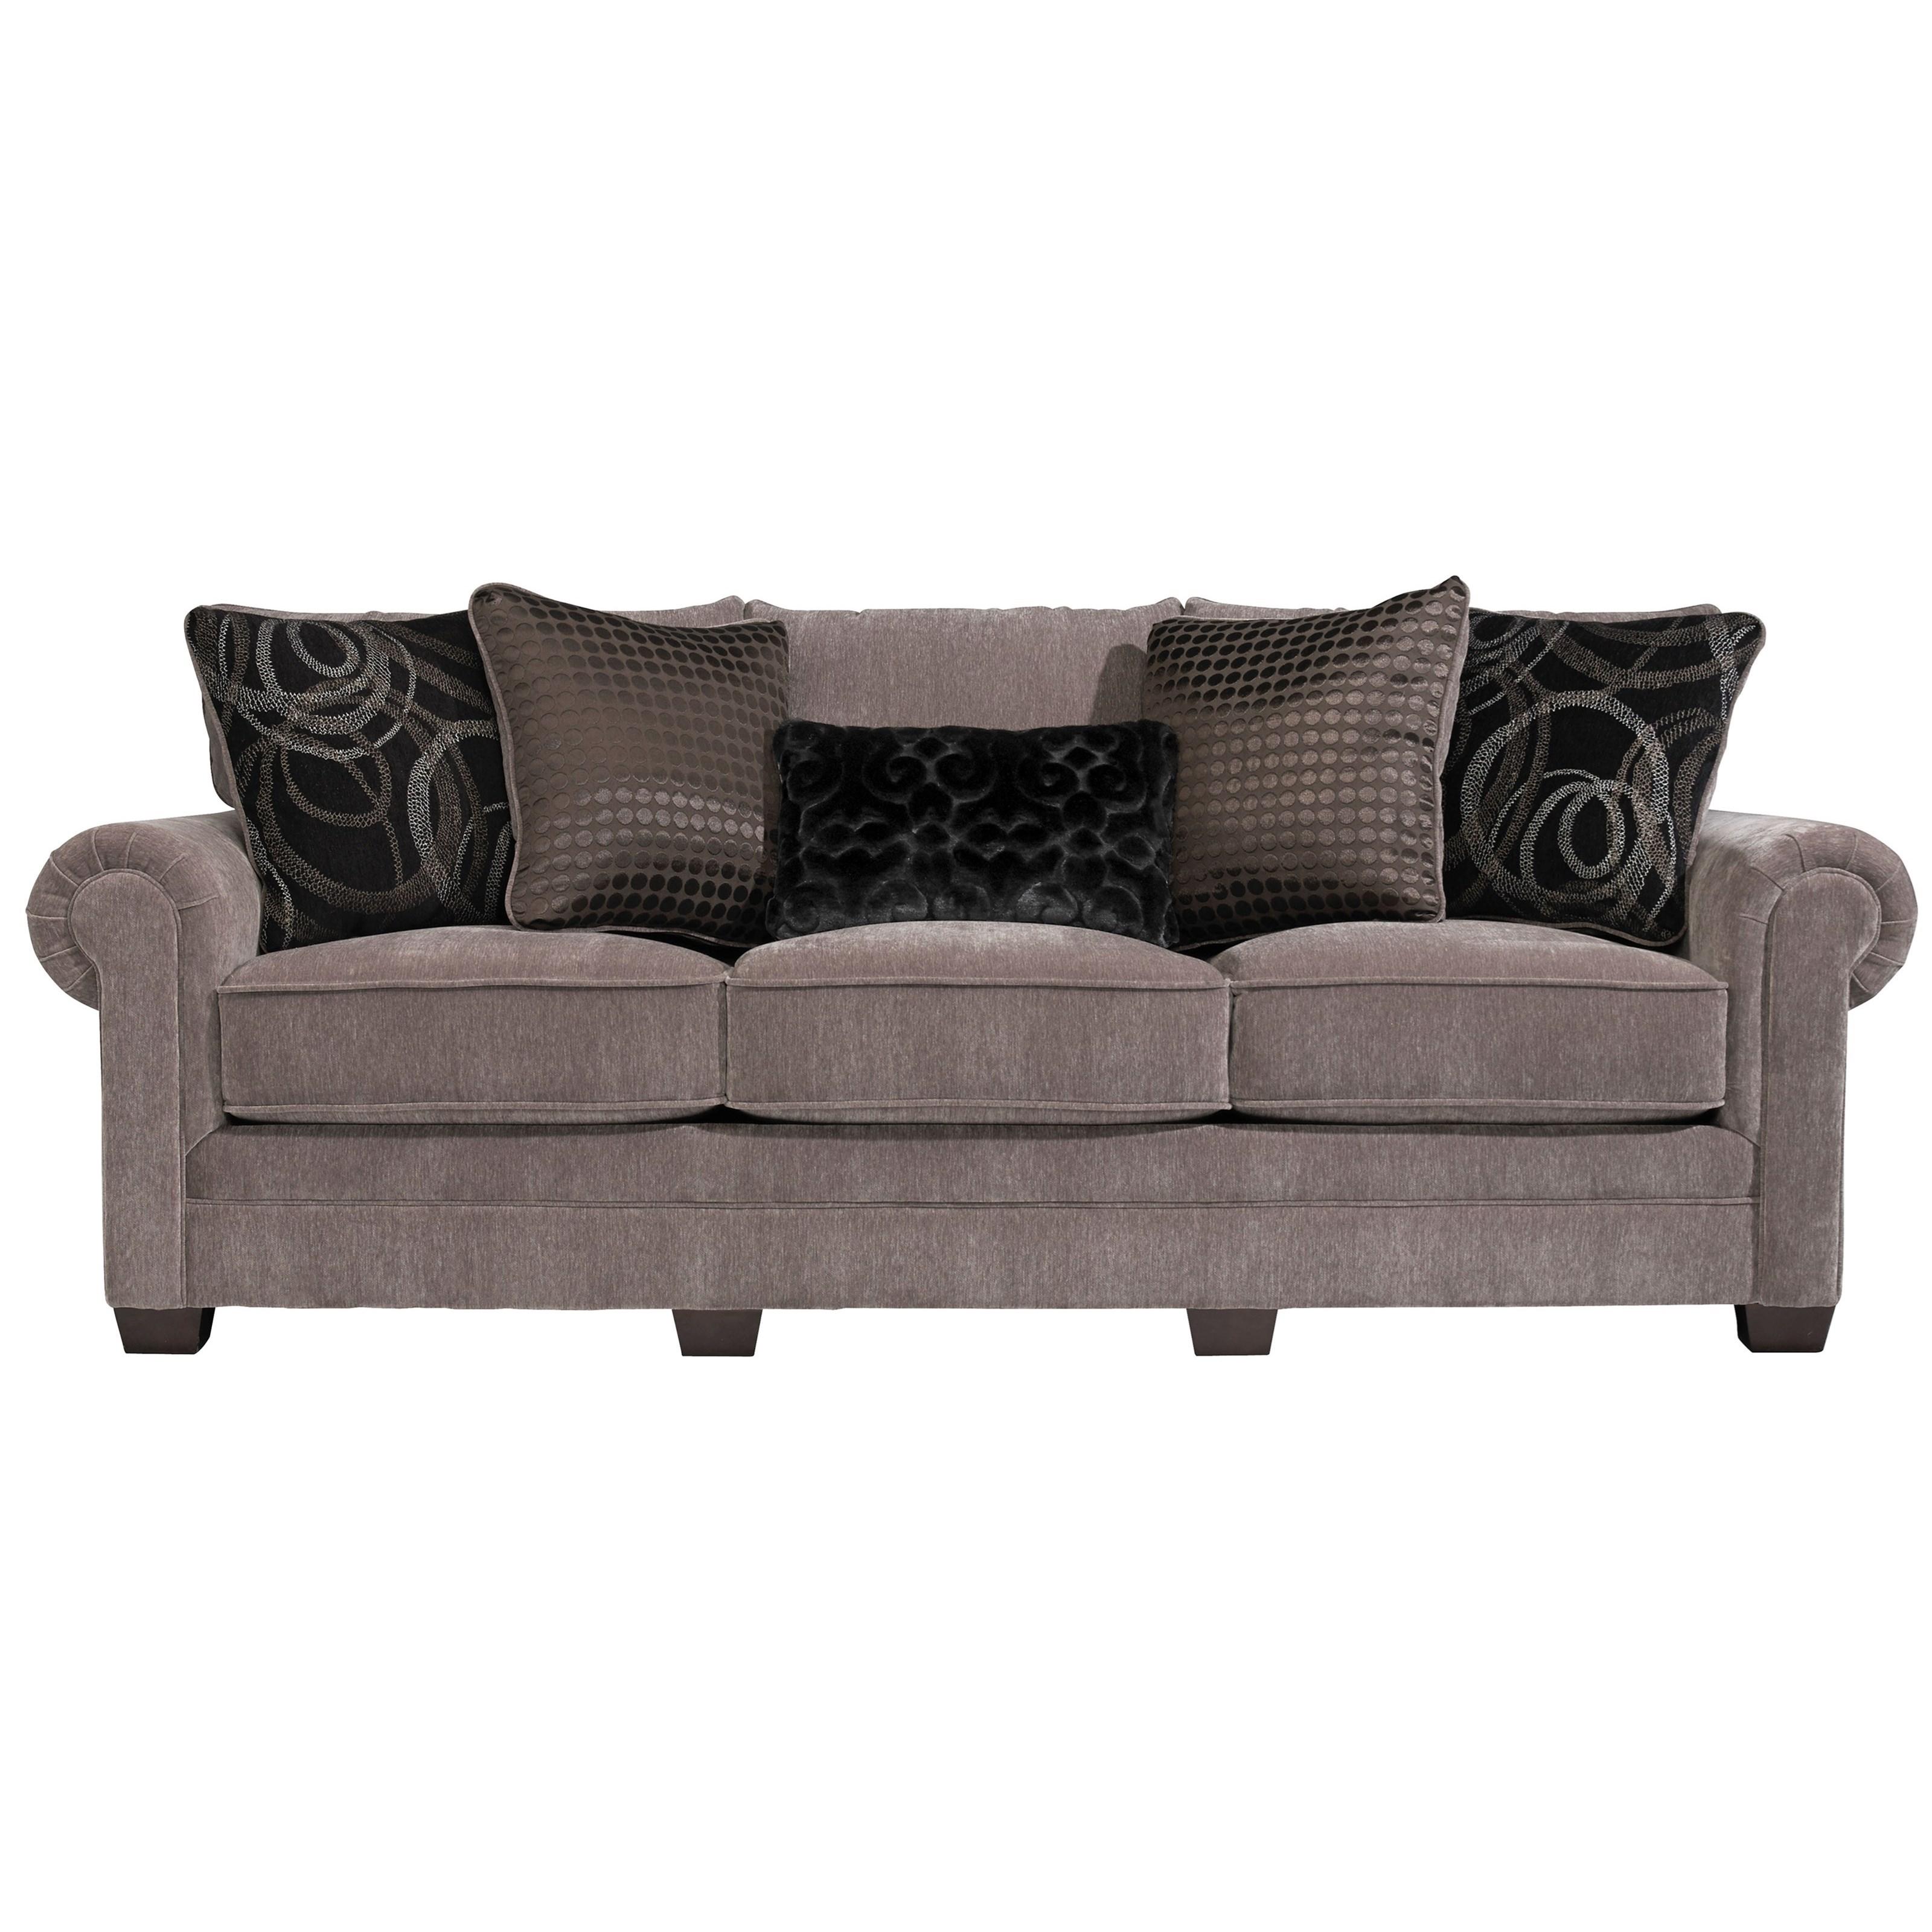 Austin Sofa by Jackson Furniture at Standard Furniture